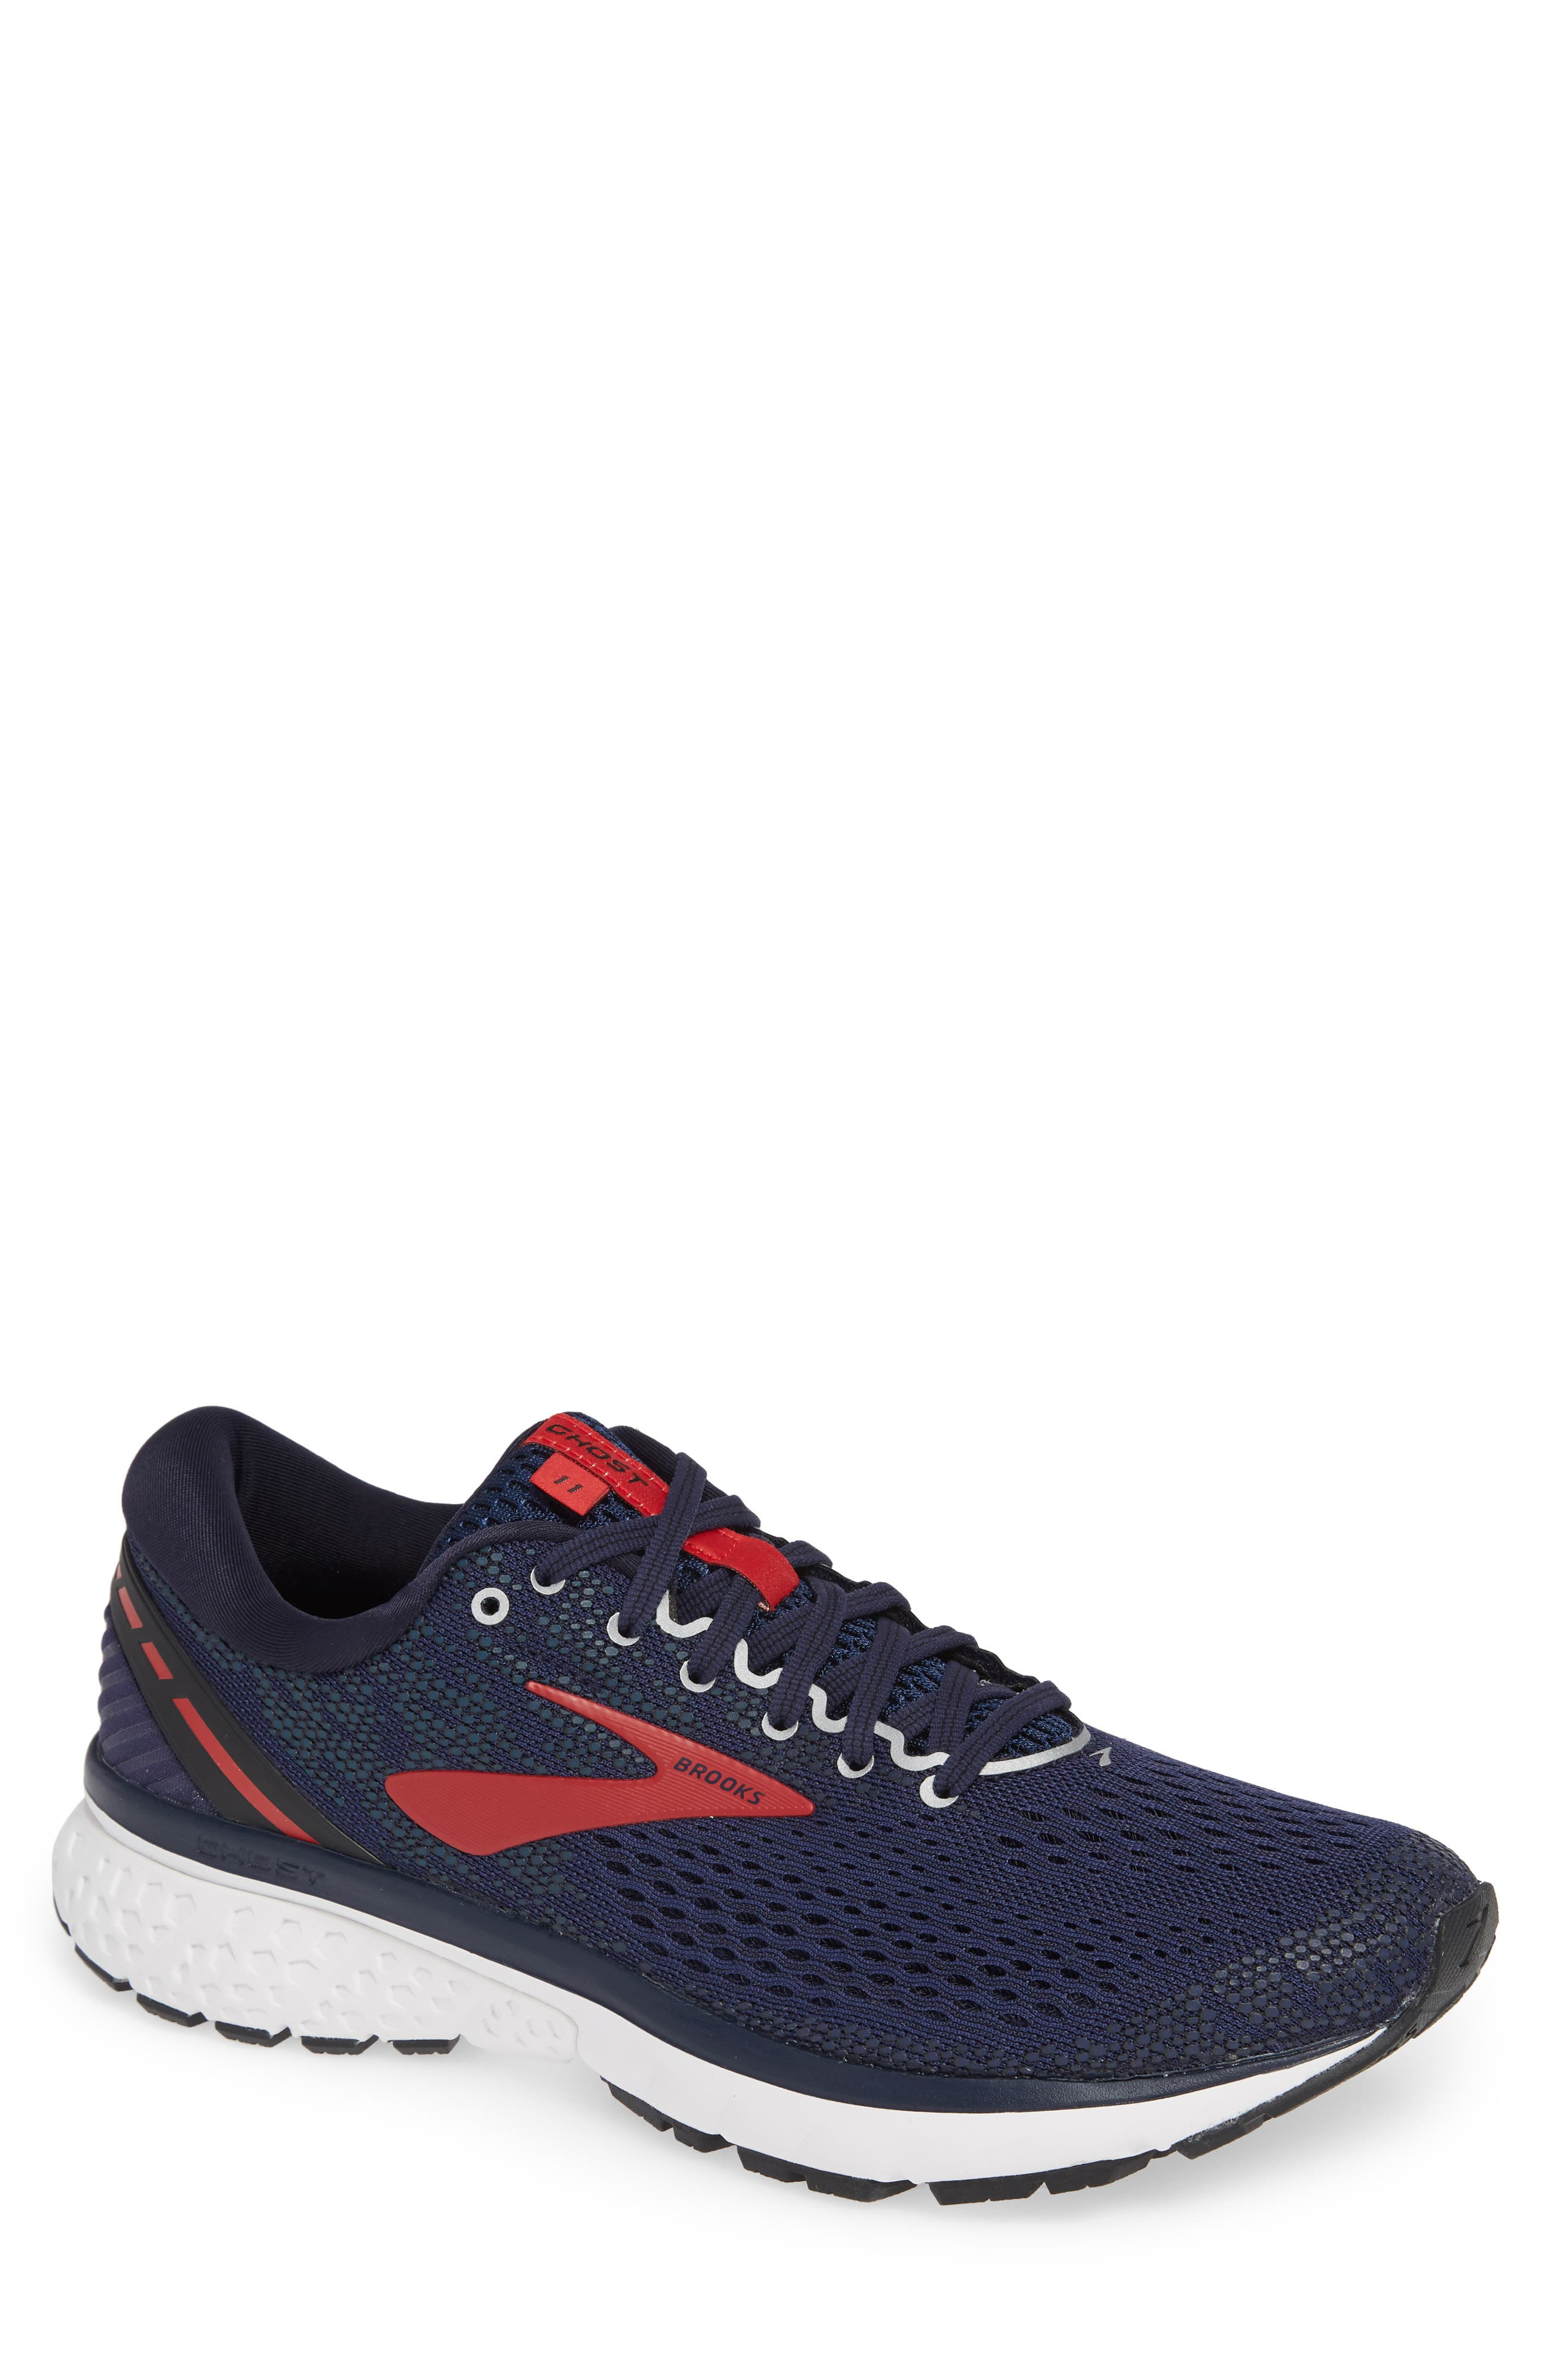 Brooks Ghost 11 Running Shoe, Blue